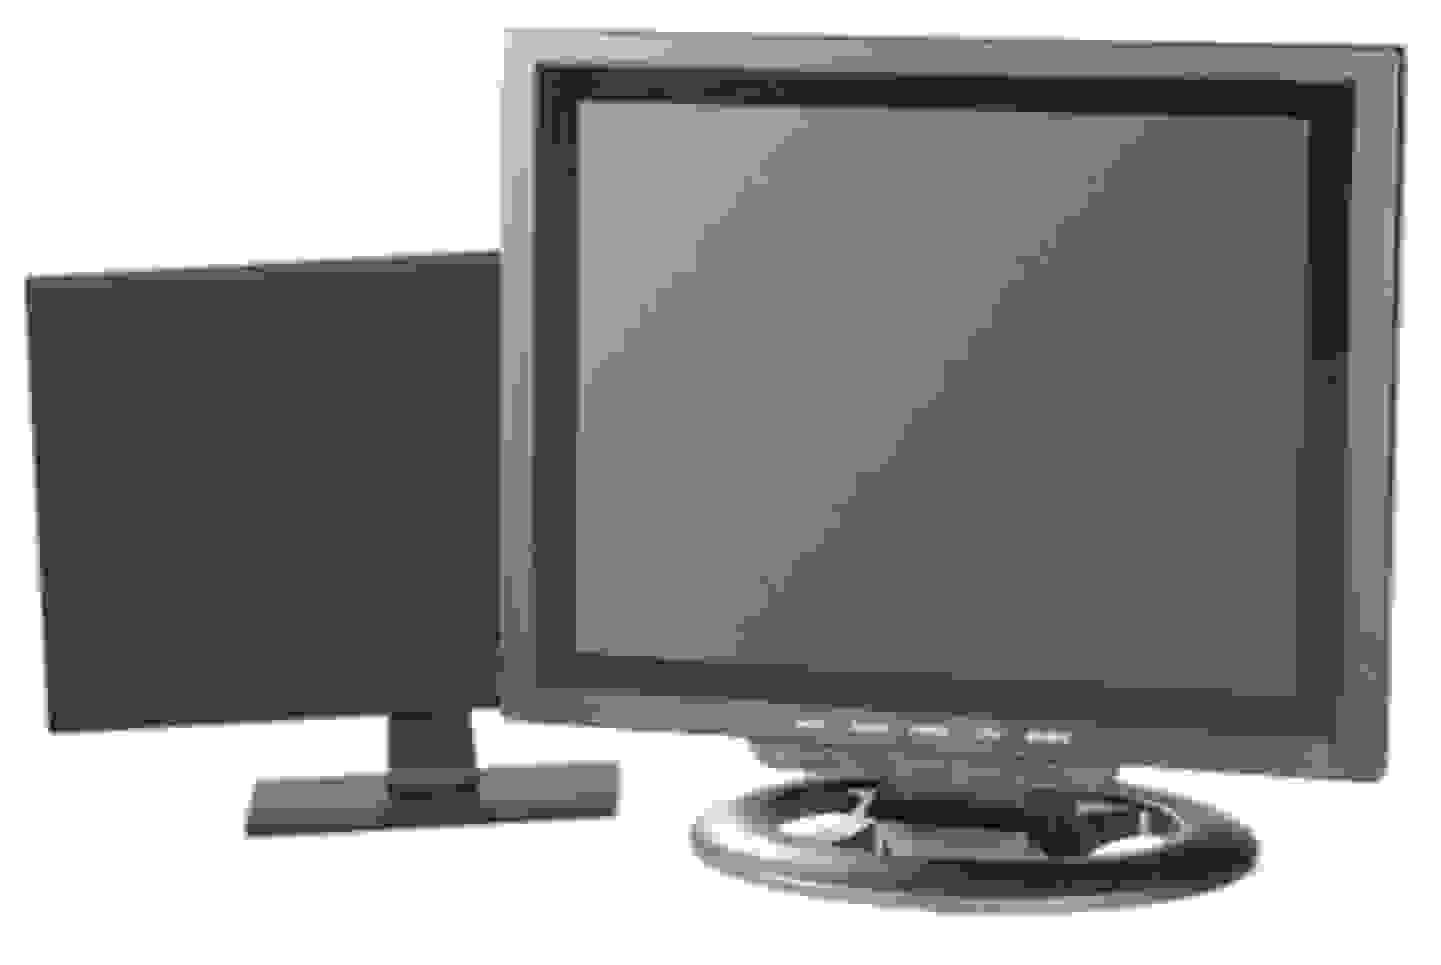 Kabelgebundene Videoüberwachung